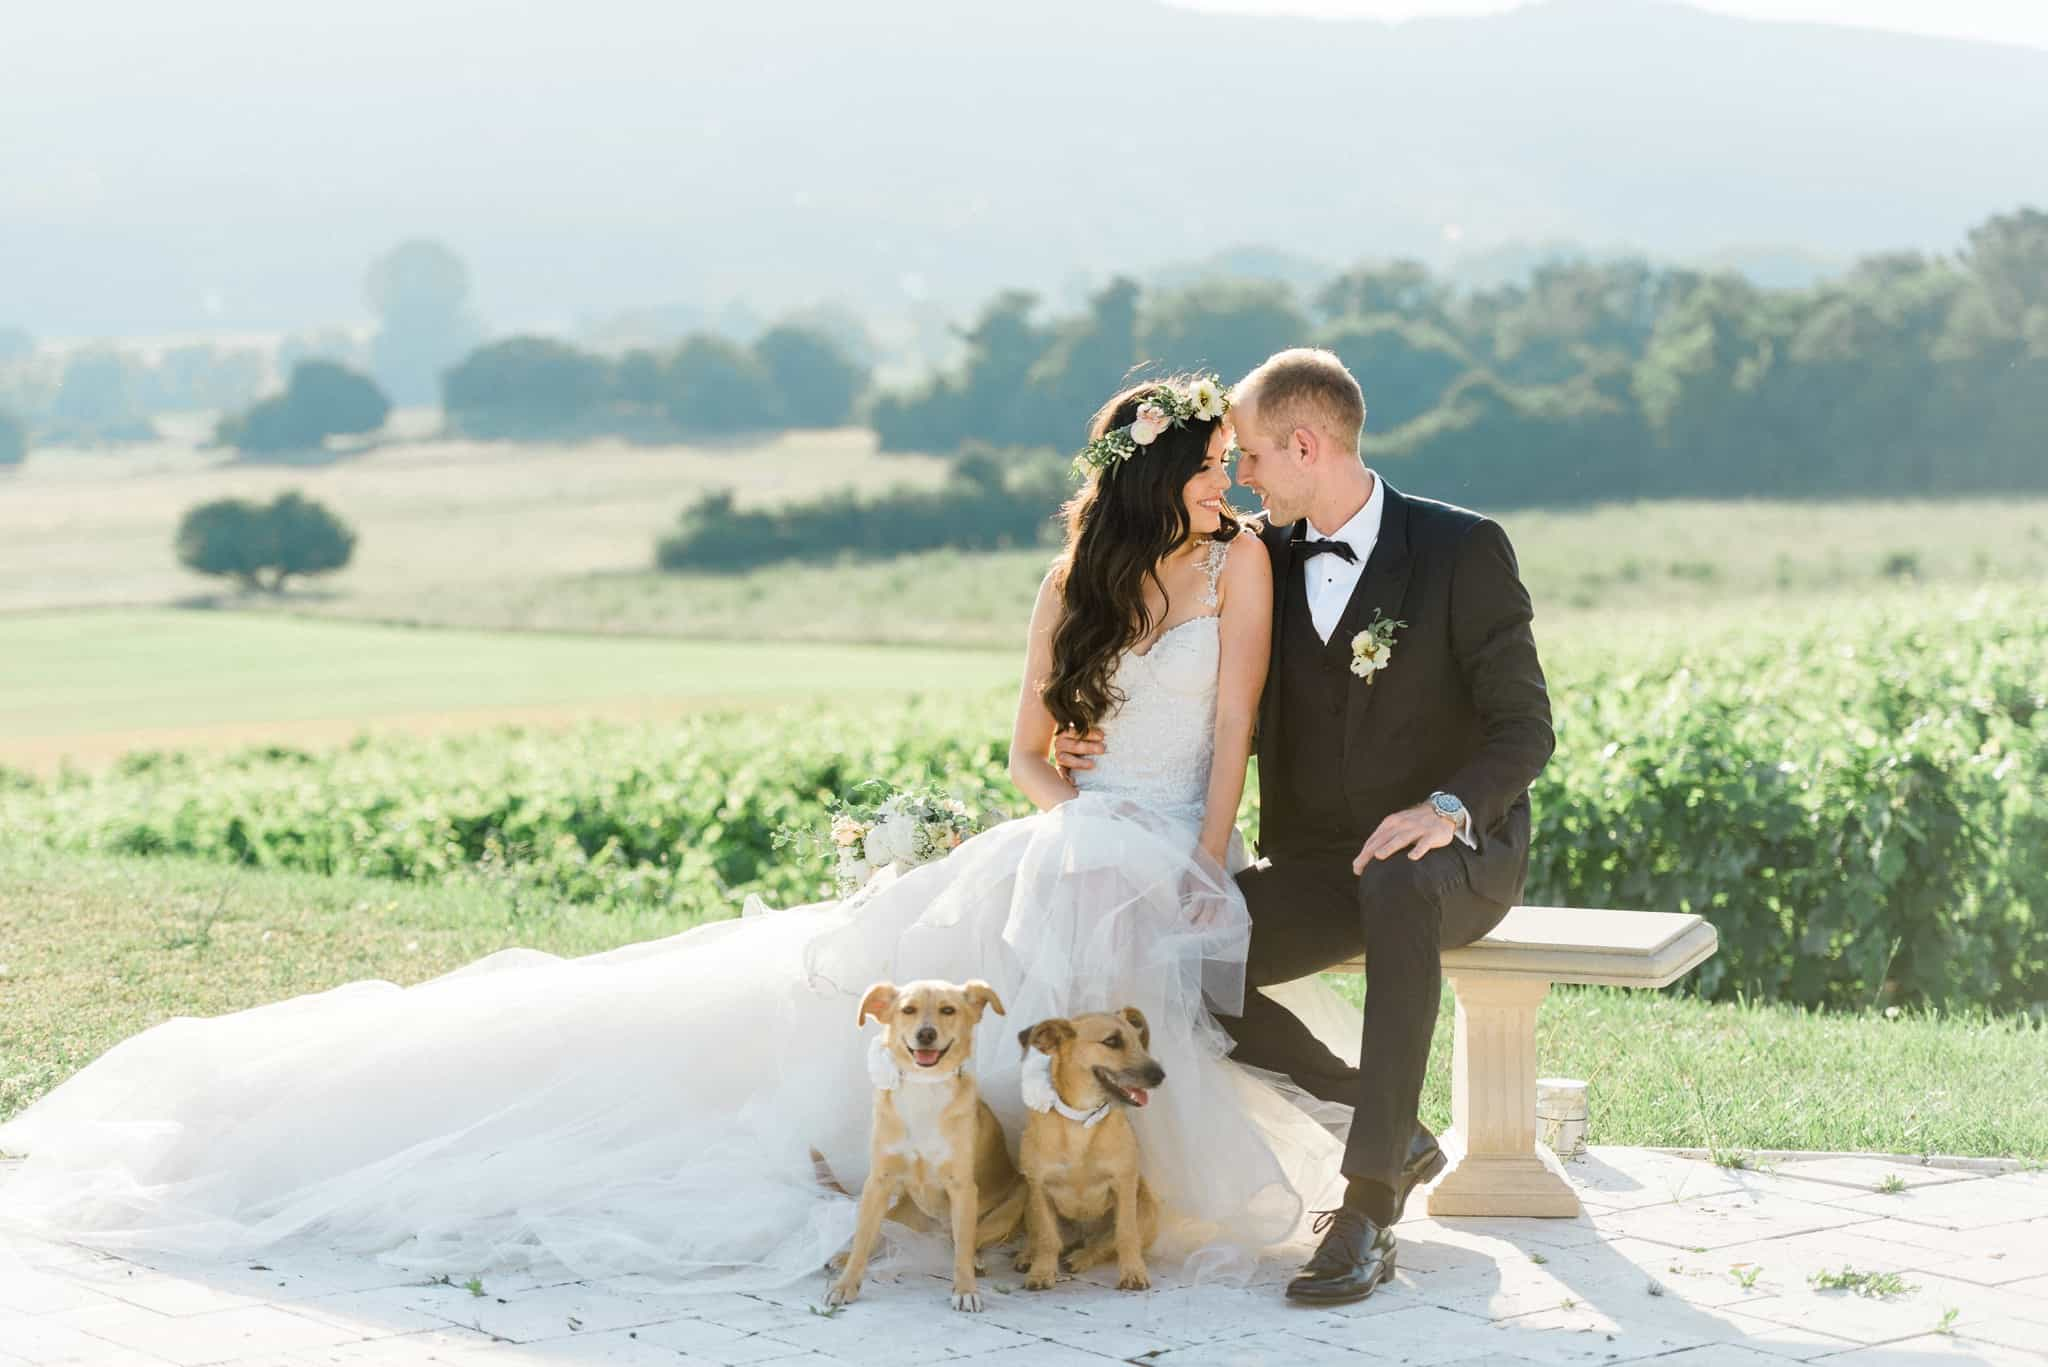 Wedoverhills_Prewedding_Hungary_Wedding_Photographer_0027